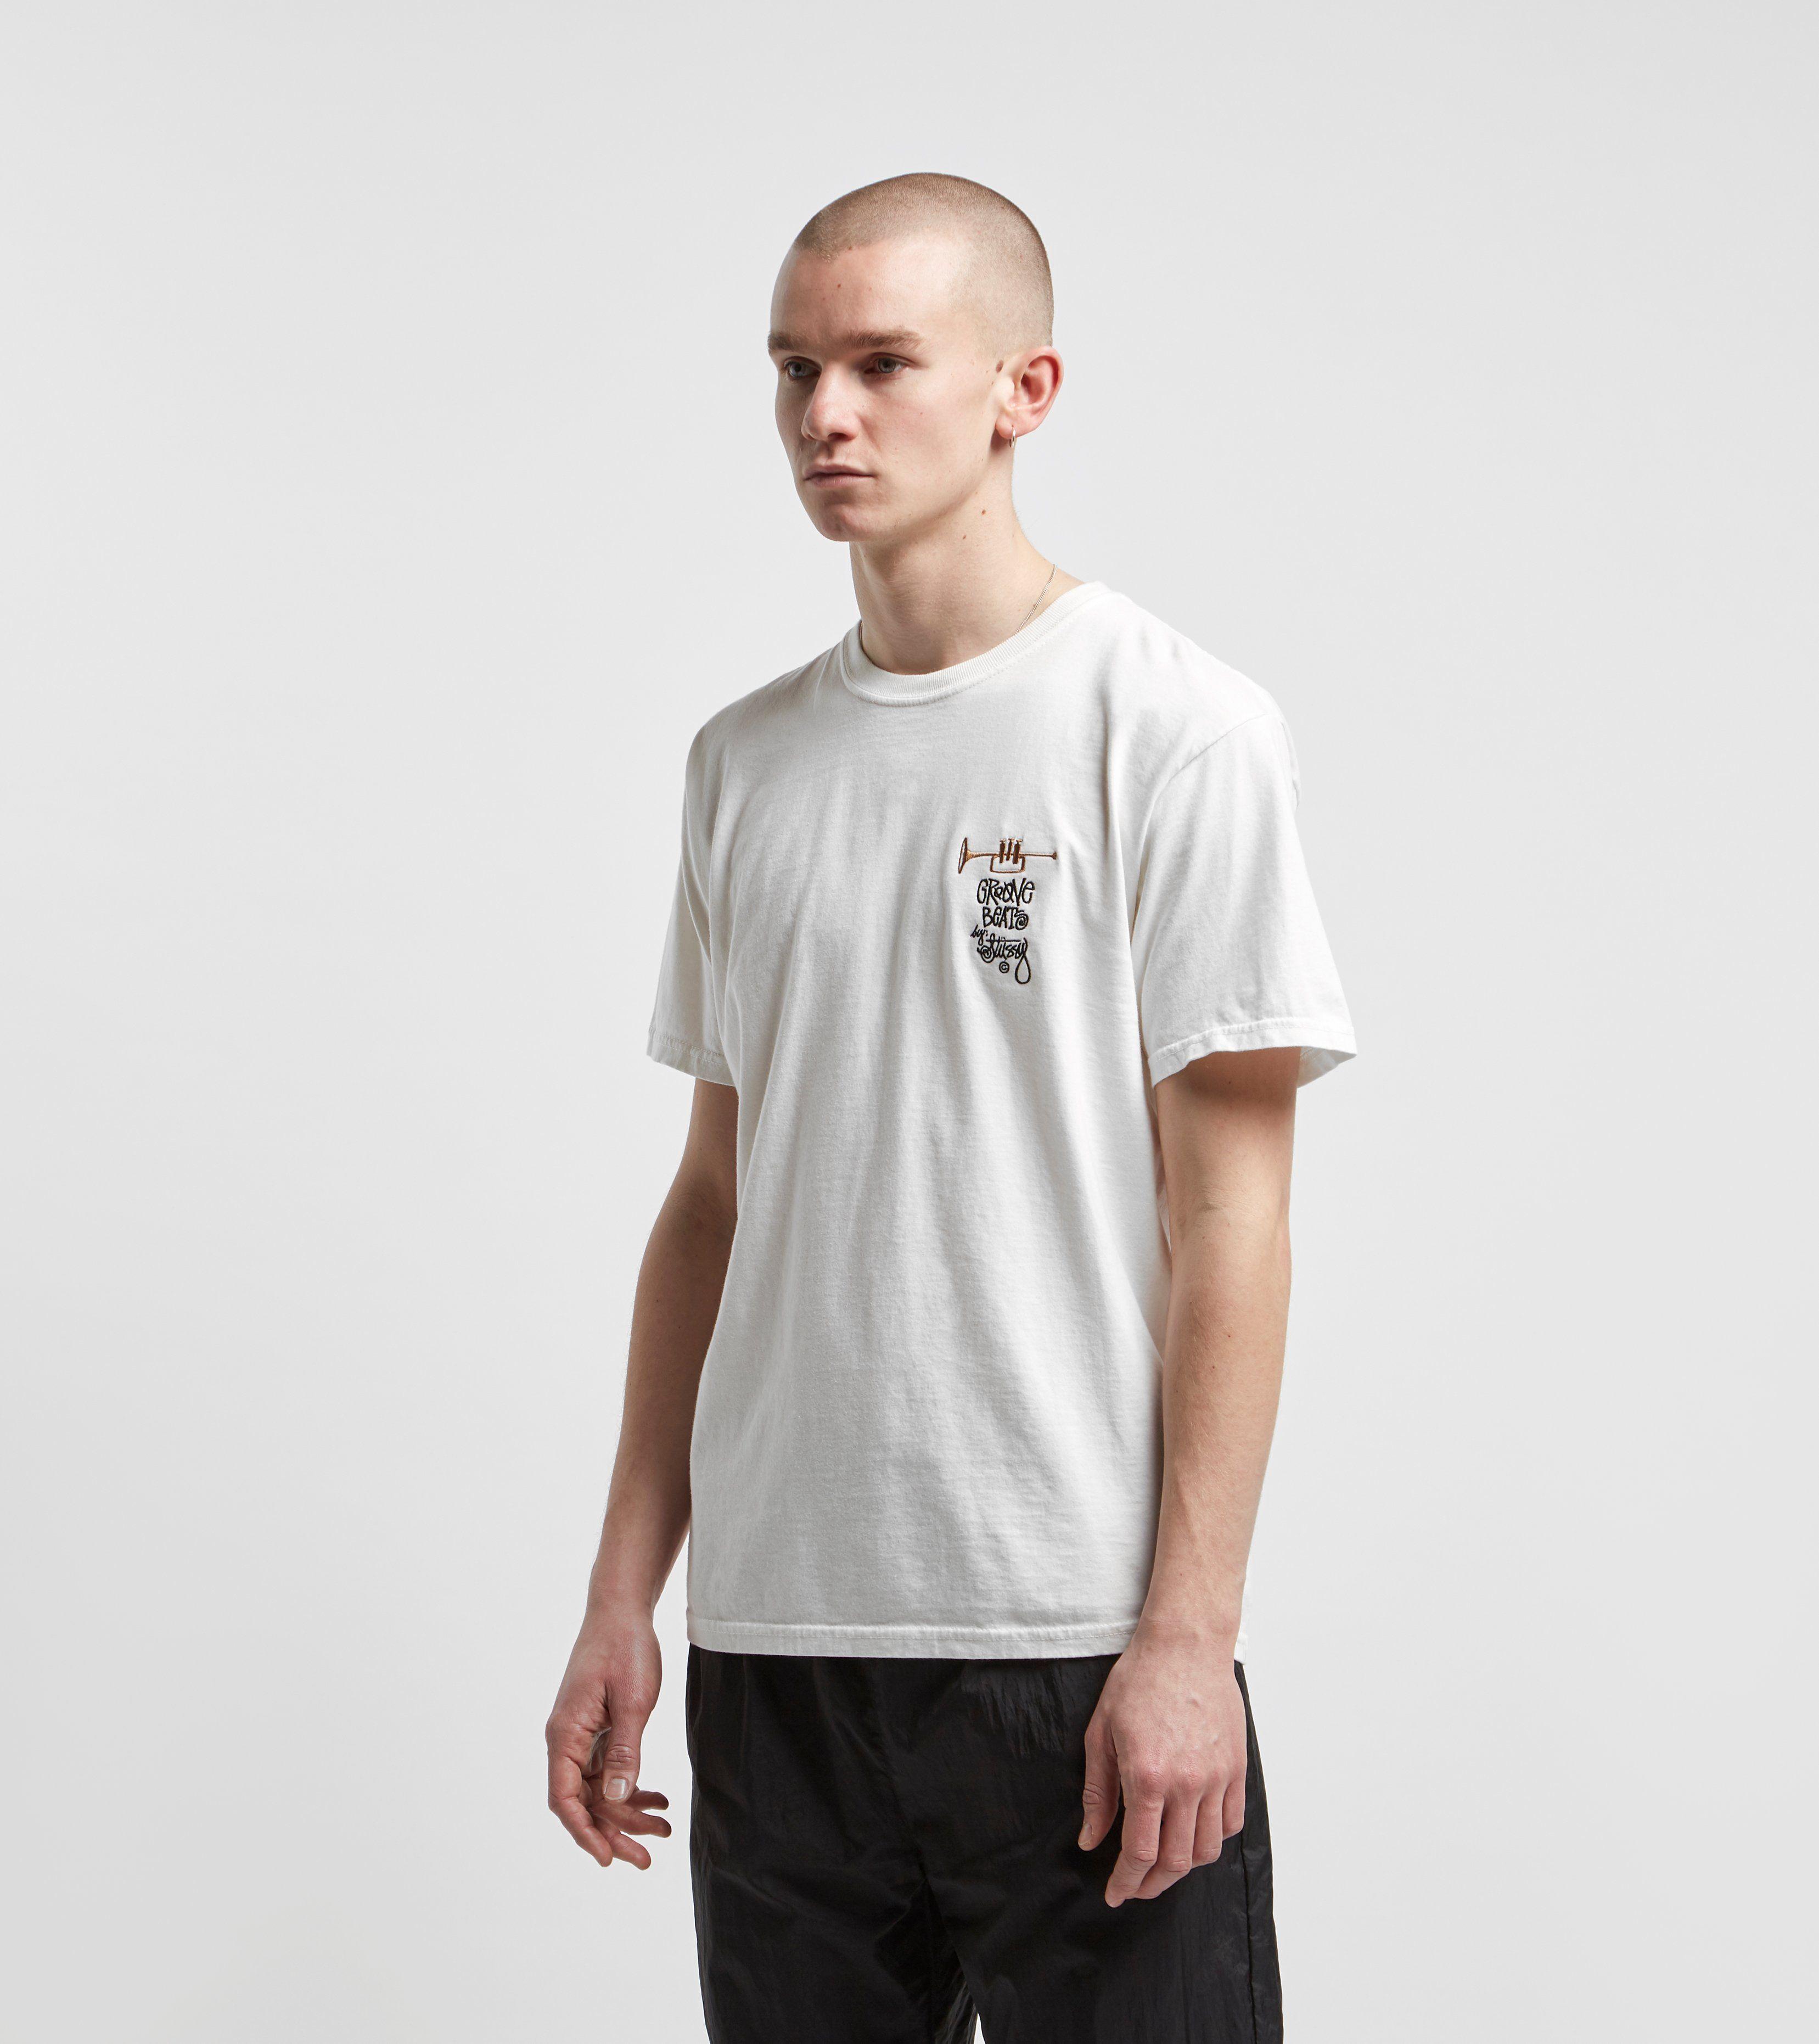 Stussy Groove Beats T-Shirt